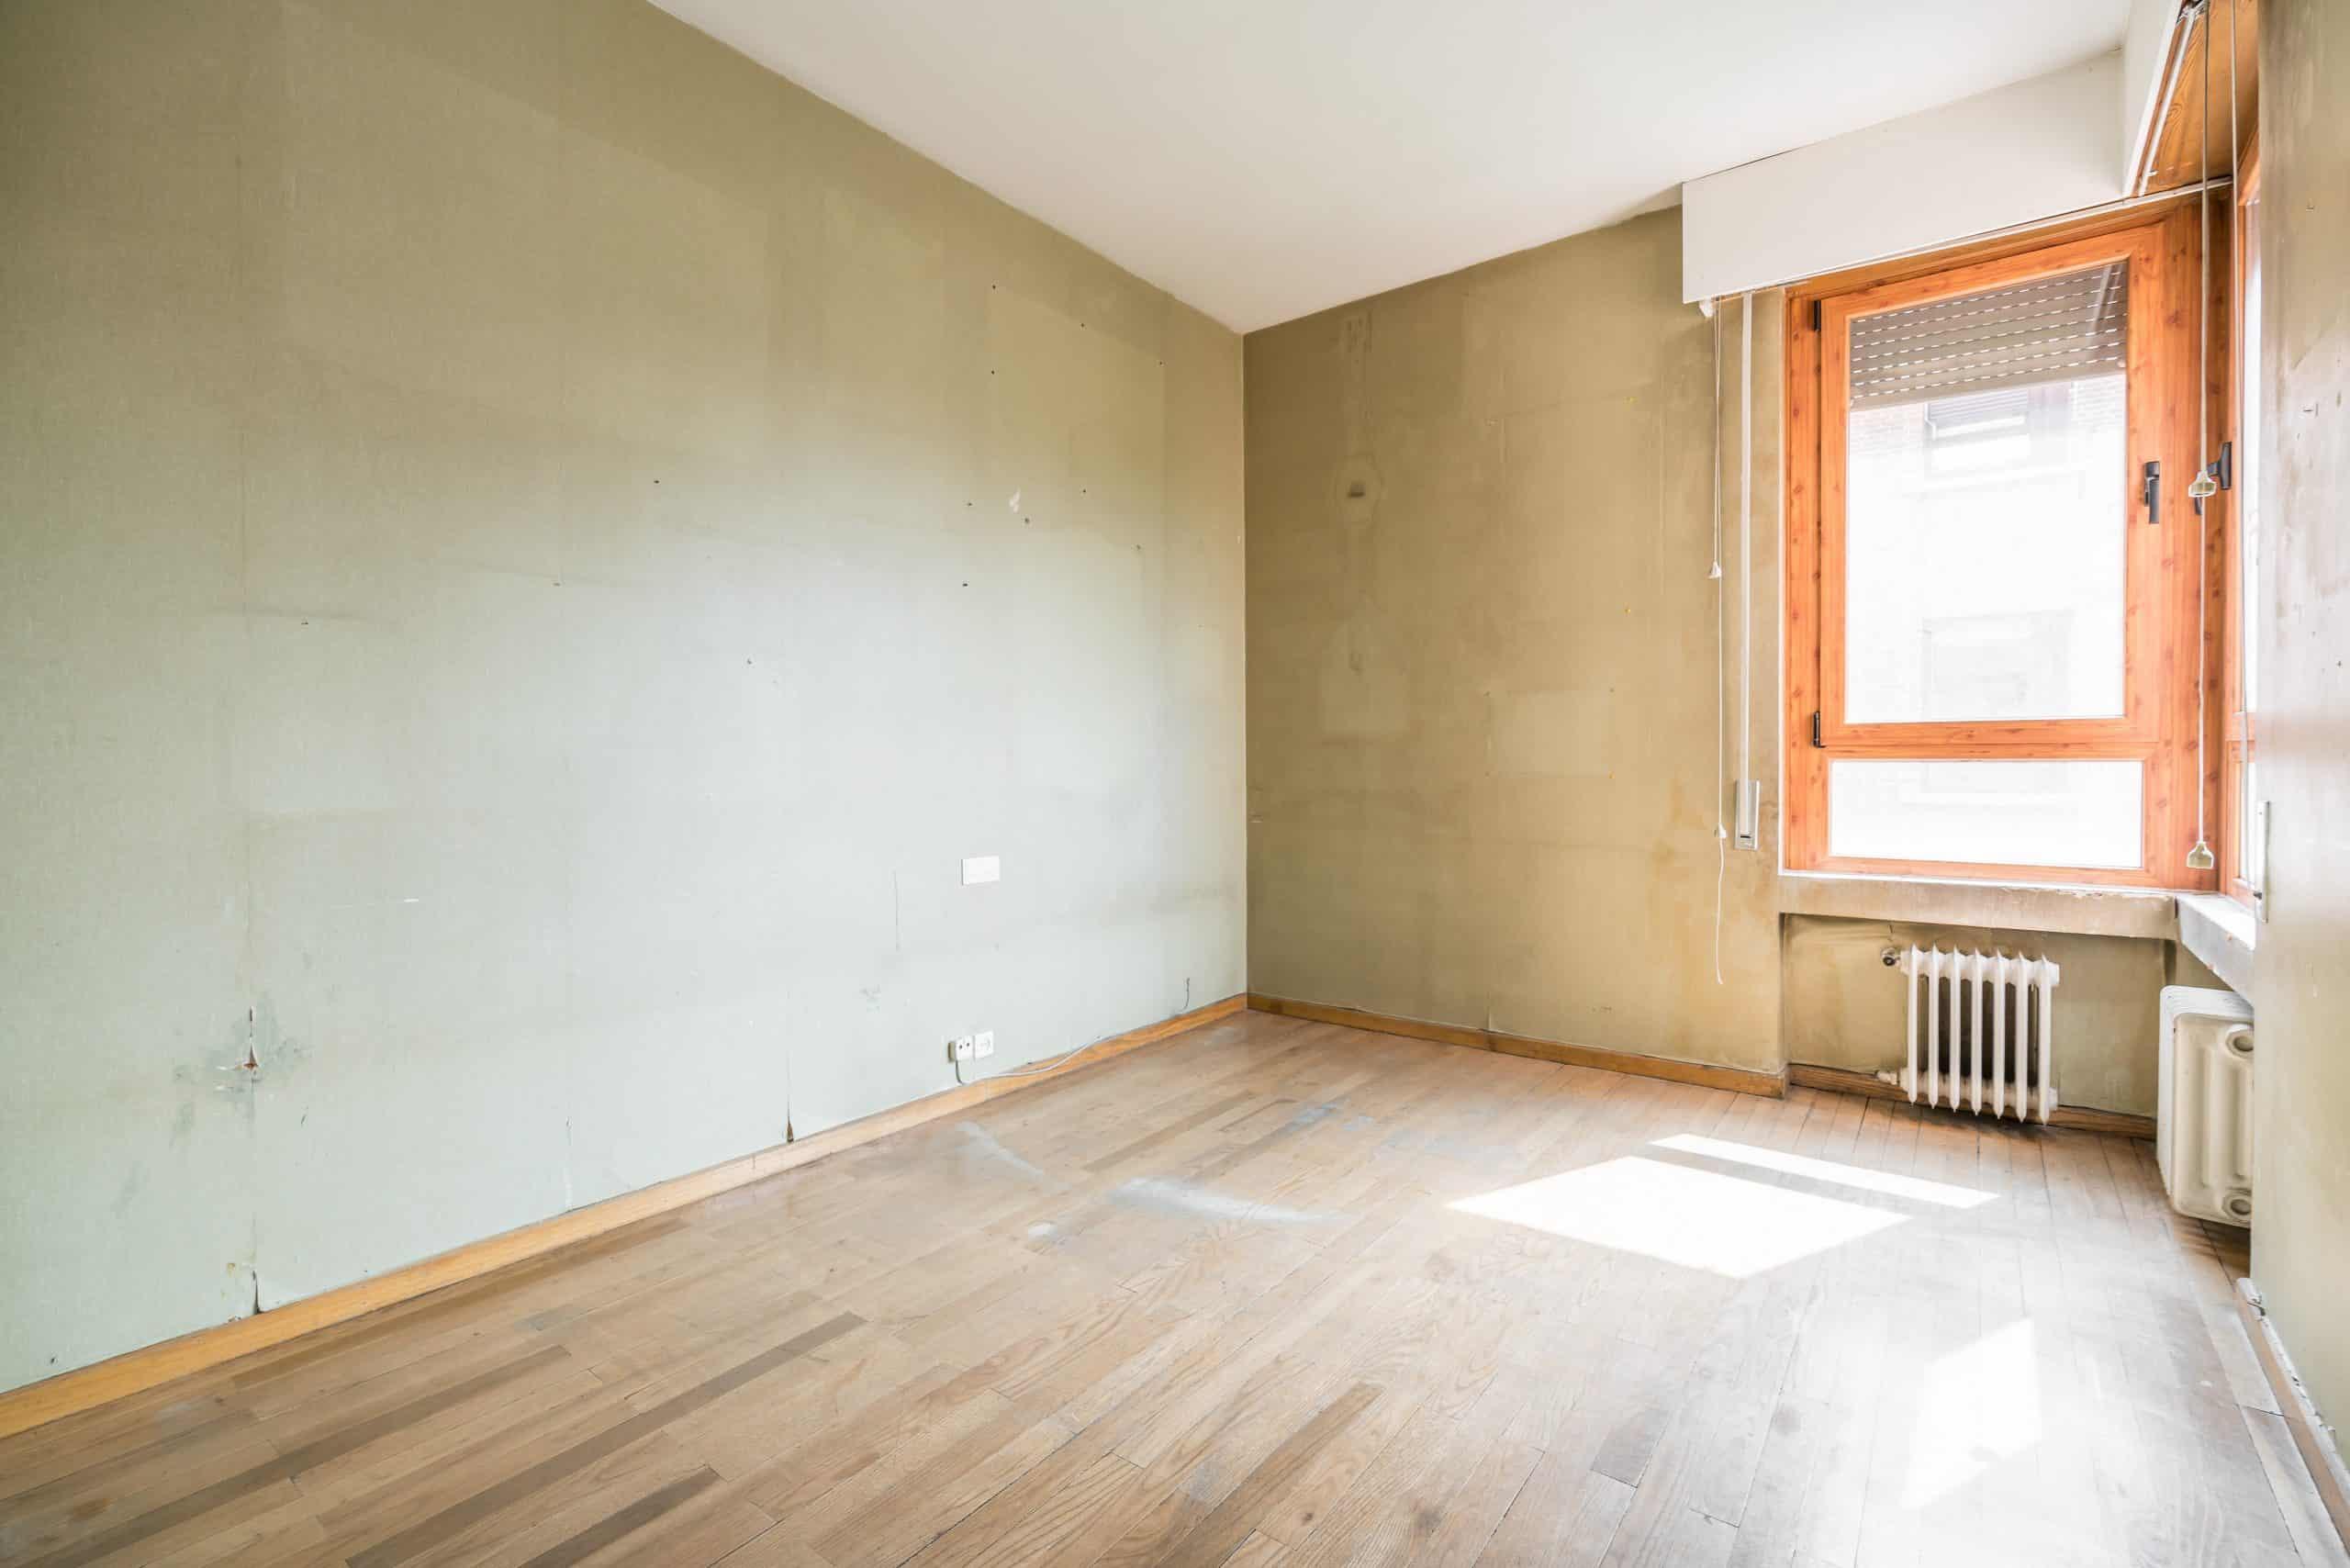 Agencia Inmobiliaria de Madrid-FUTUROCASA-Zona ARGANZUELA-EMBAJADORES-LEGAZPI -calle Embajadores- baño 137